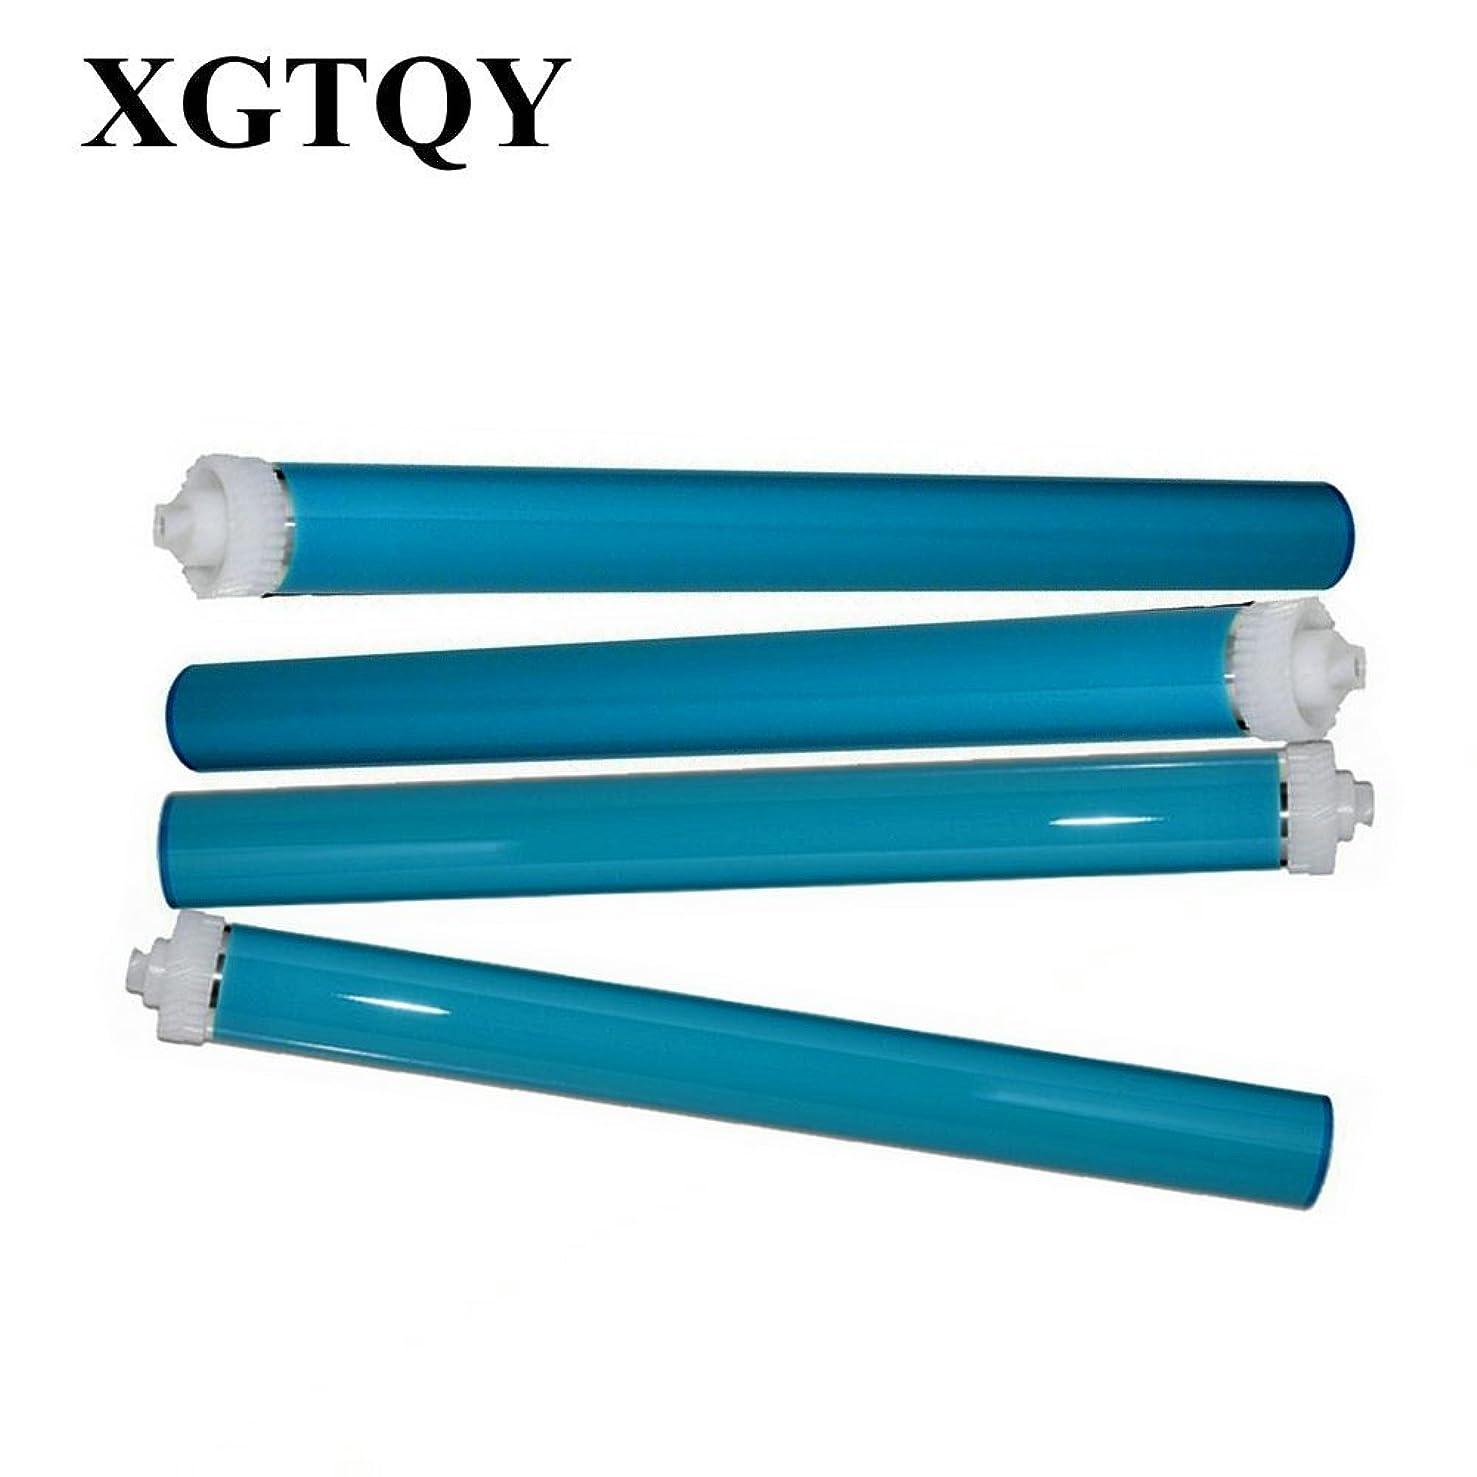 10PCS/Lot XGTQY OPC Drum for HP C7115A C7115X Q2624A Q2624X Q2613A Q2613X C3906F C4092A 15A 24A 24X 13A 13X 06F 92A Toner Cartridge